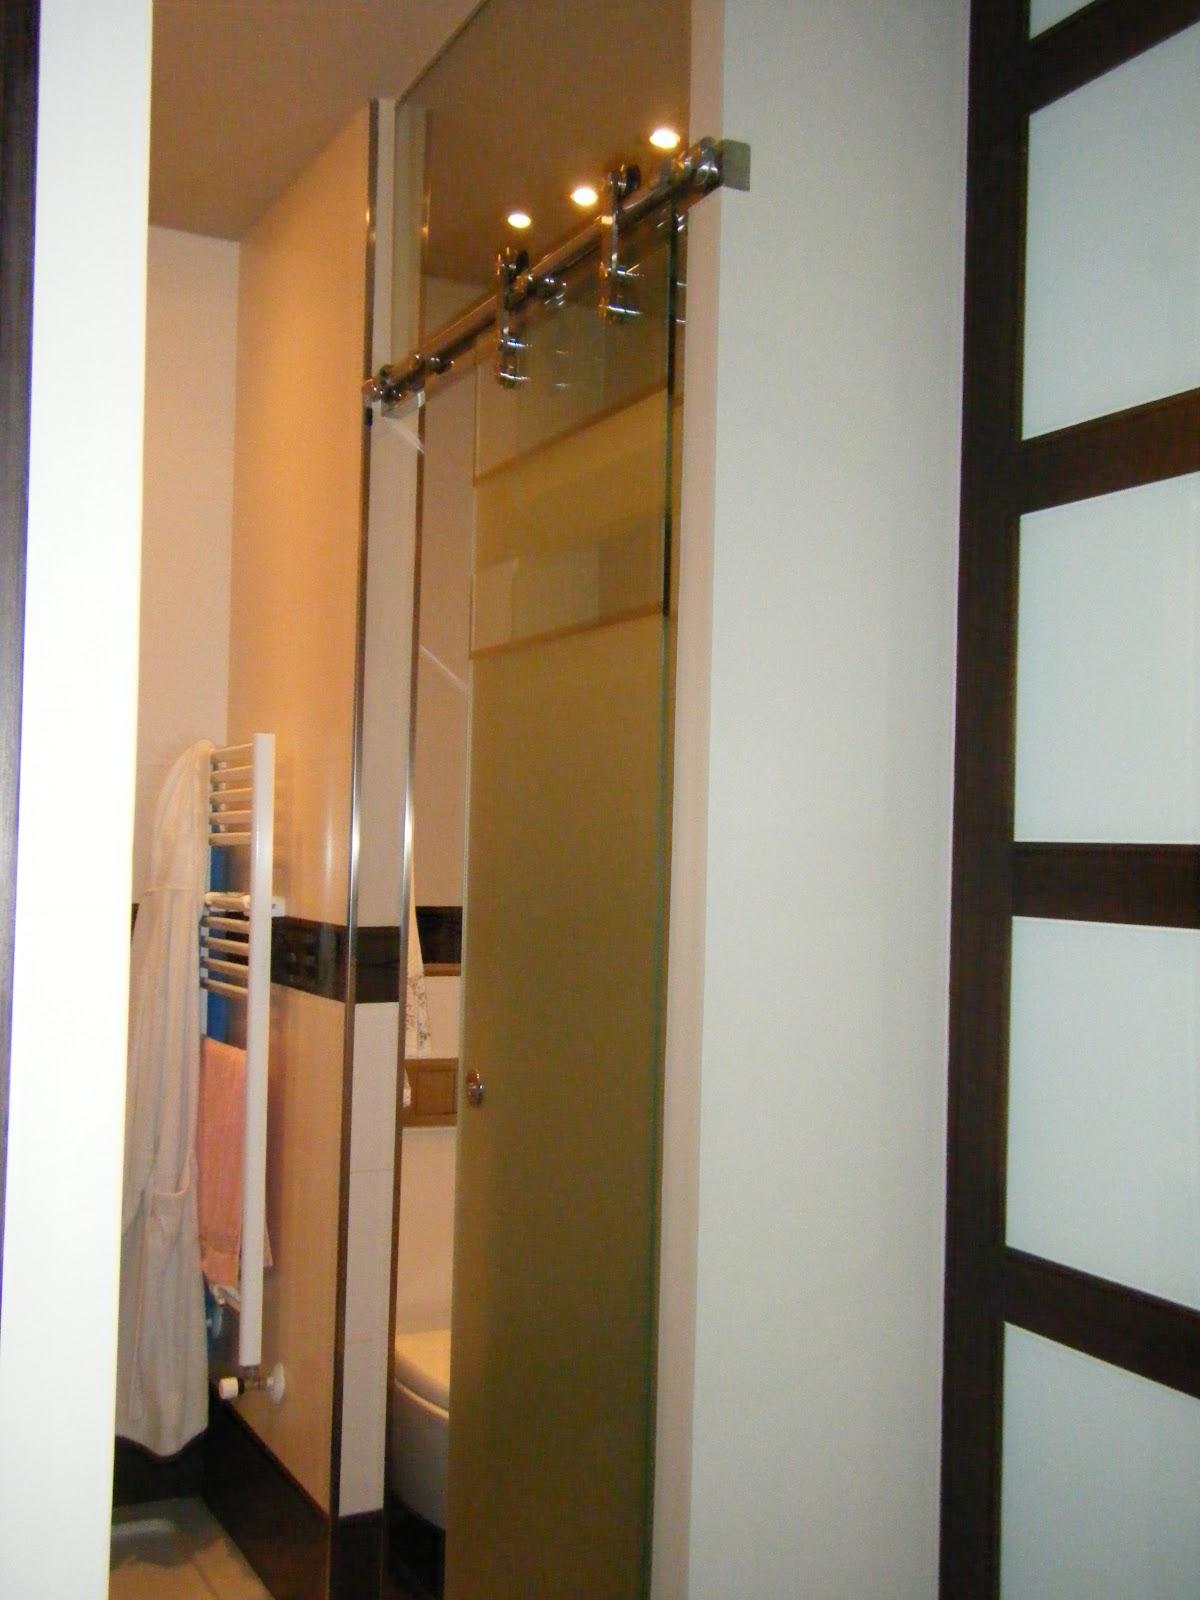 Maringlass aluminio vidrio svi 120 puerta corredera de for Oferta puerta corredera